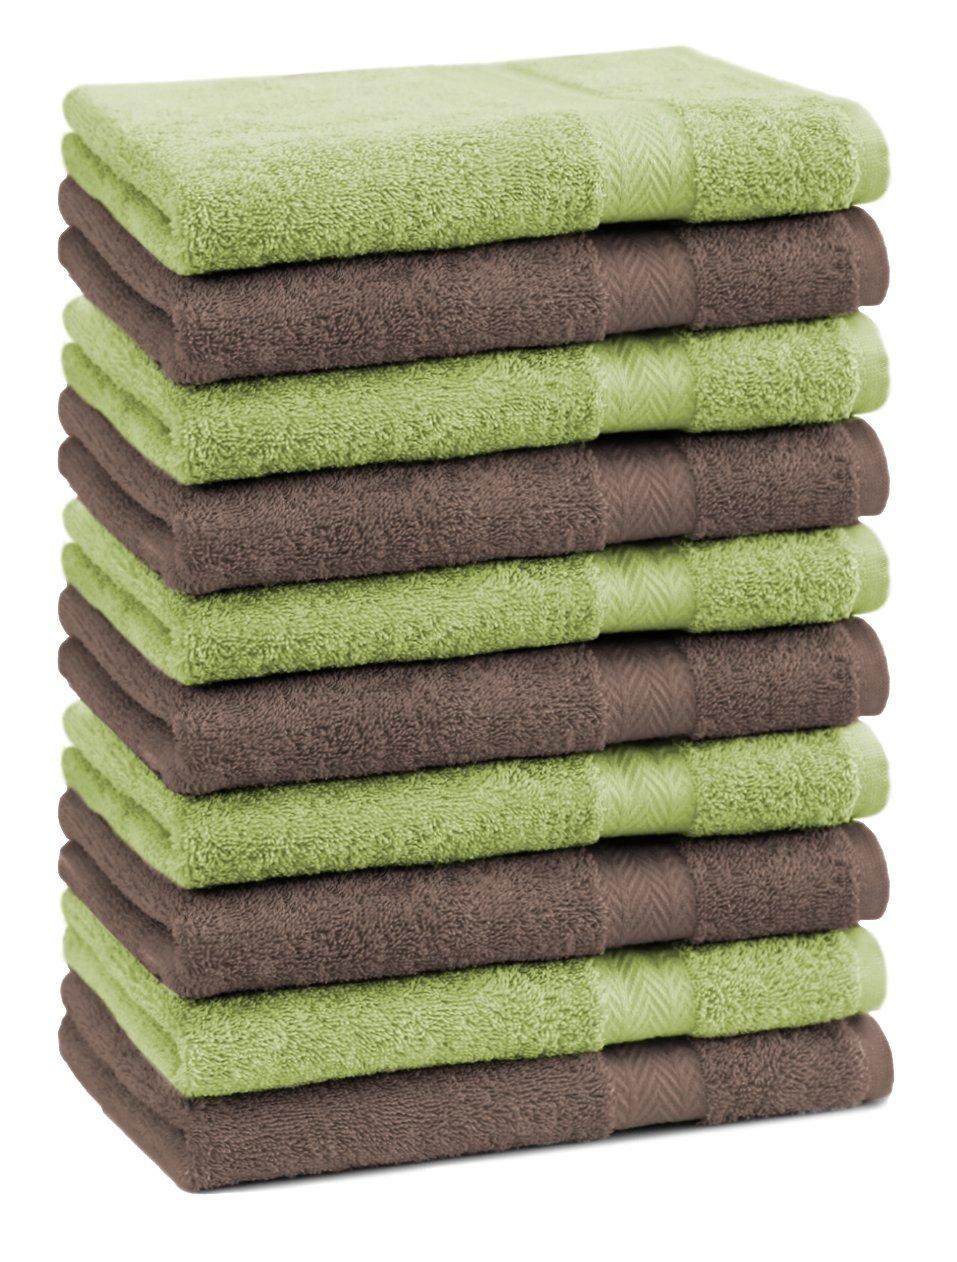 Betz. Set di 10 lavette lavetta salvietta da bidet asciugamano da bidet PREMIUM colore verde mela e marrone noce misura 30 x 30 cm